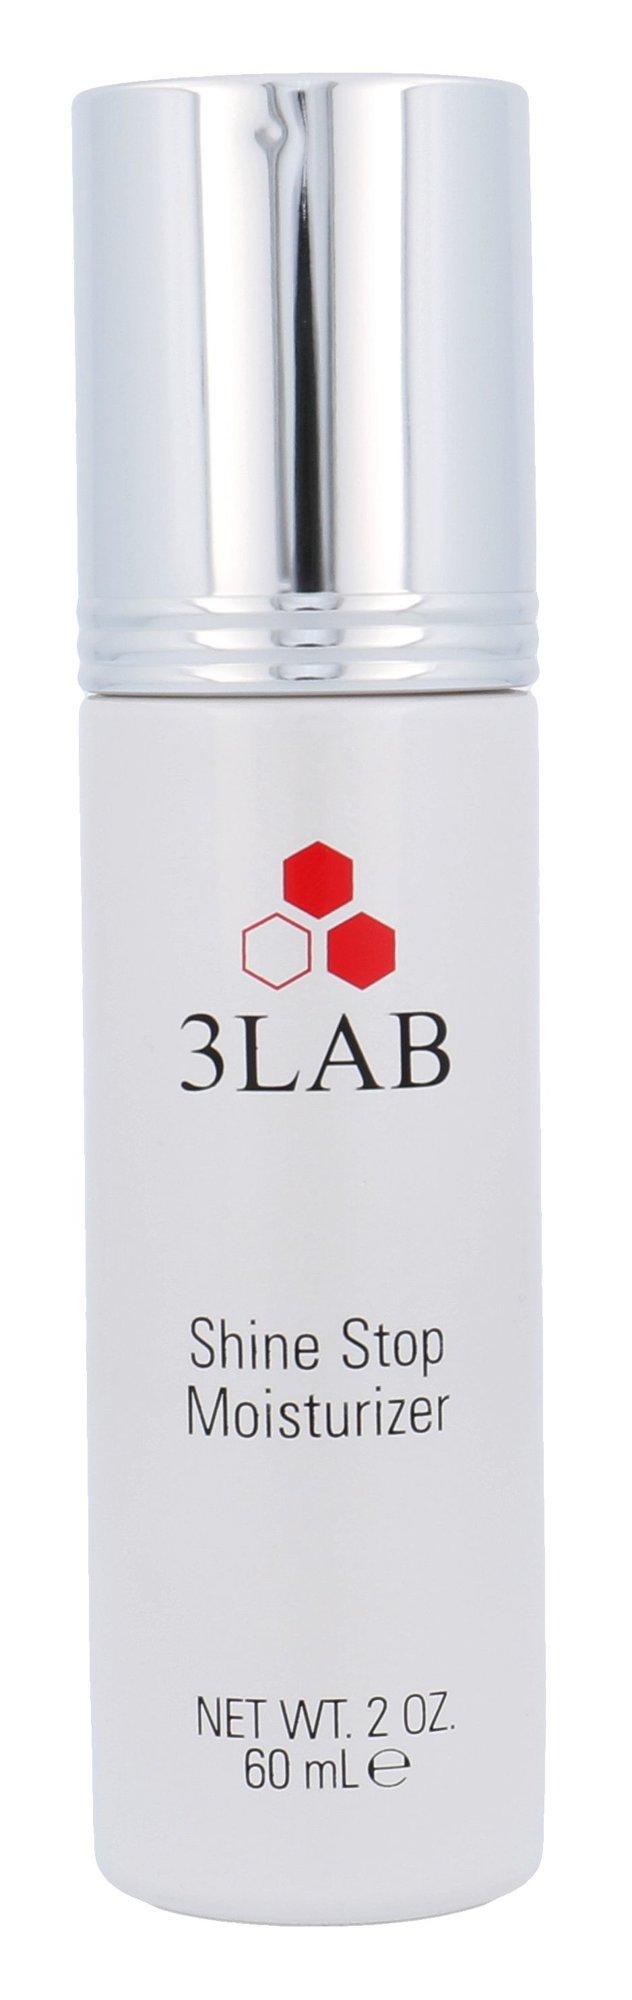 3LAB Shine Stop Moisturizer Cosmetic 60ml